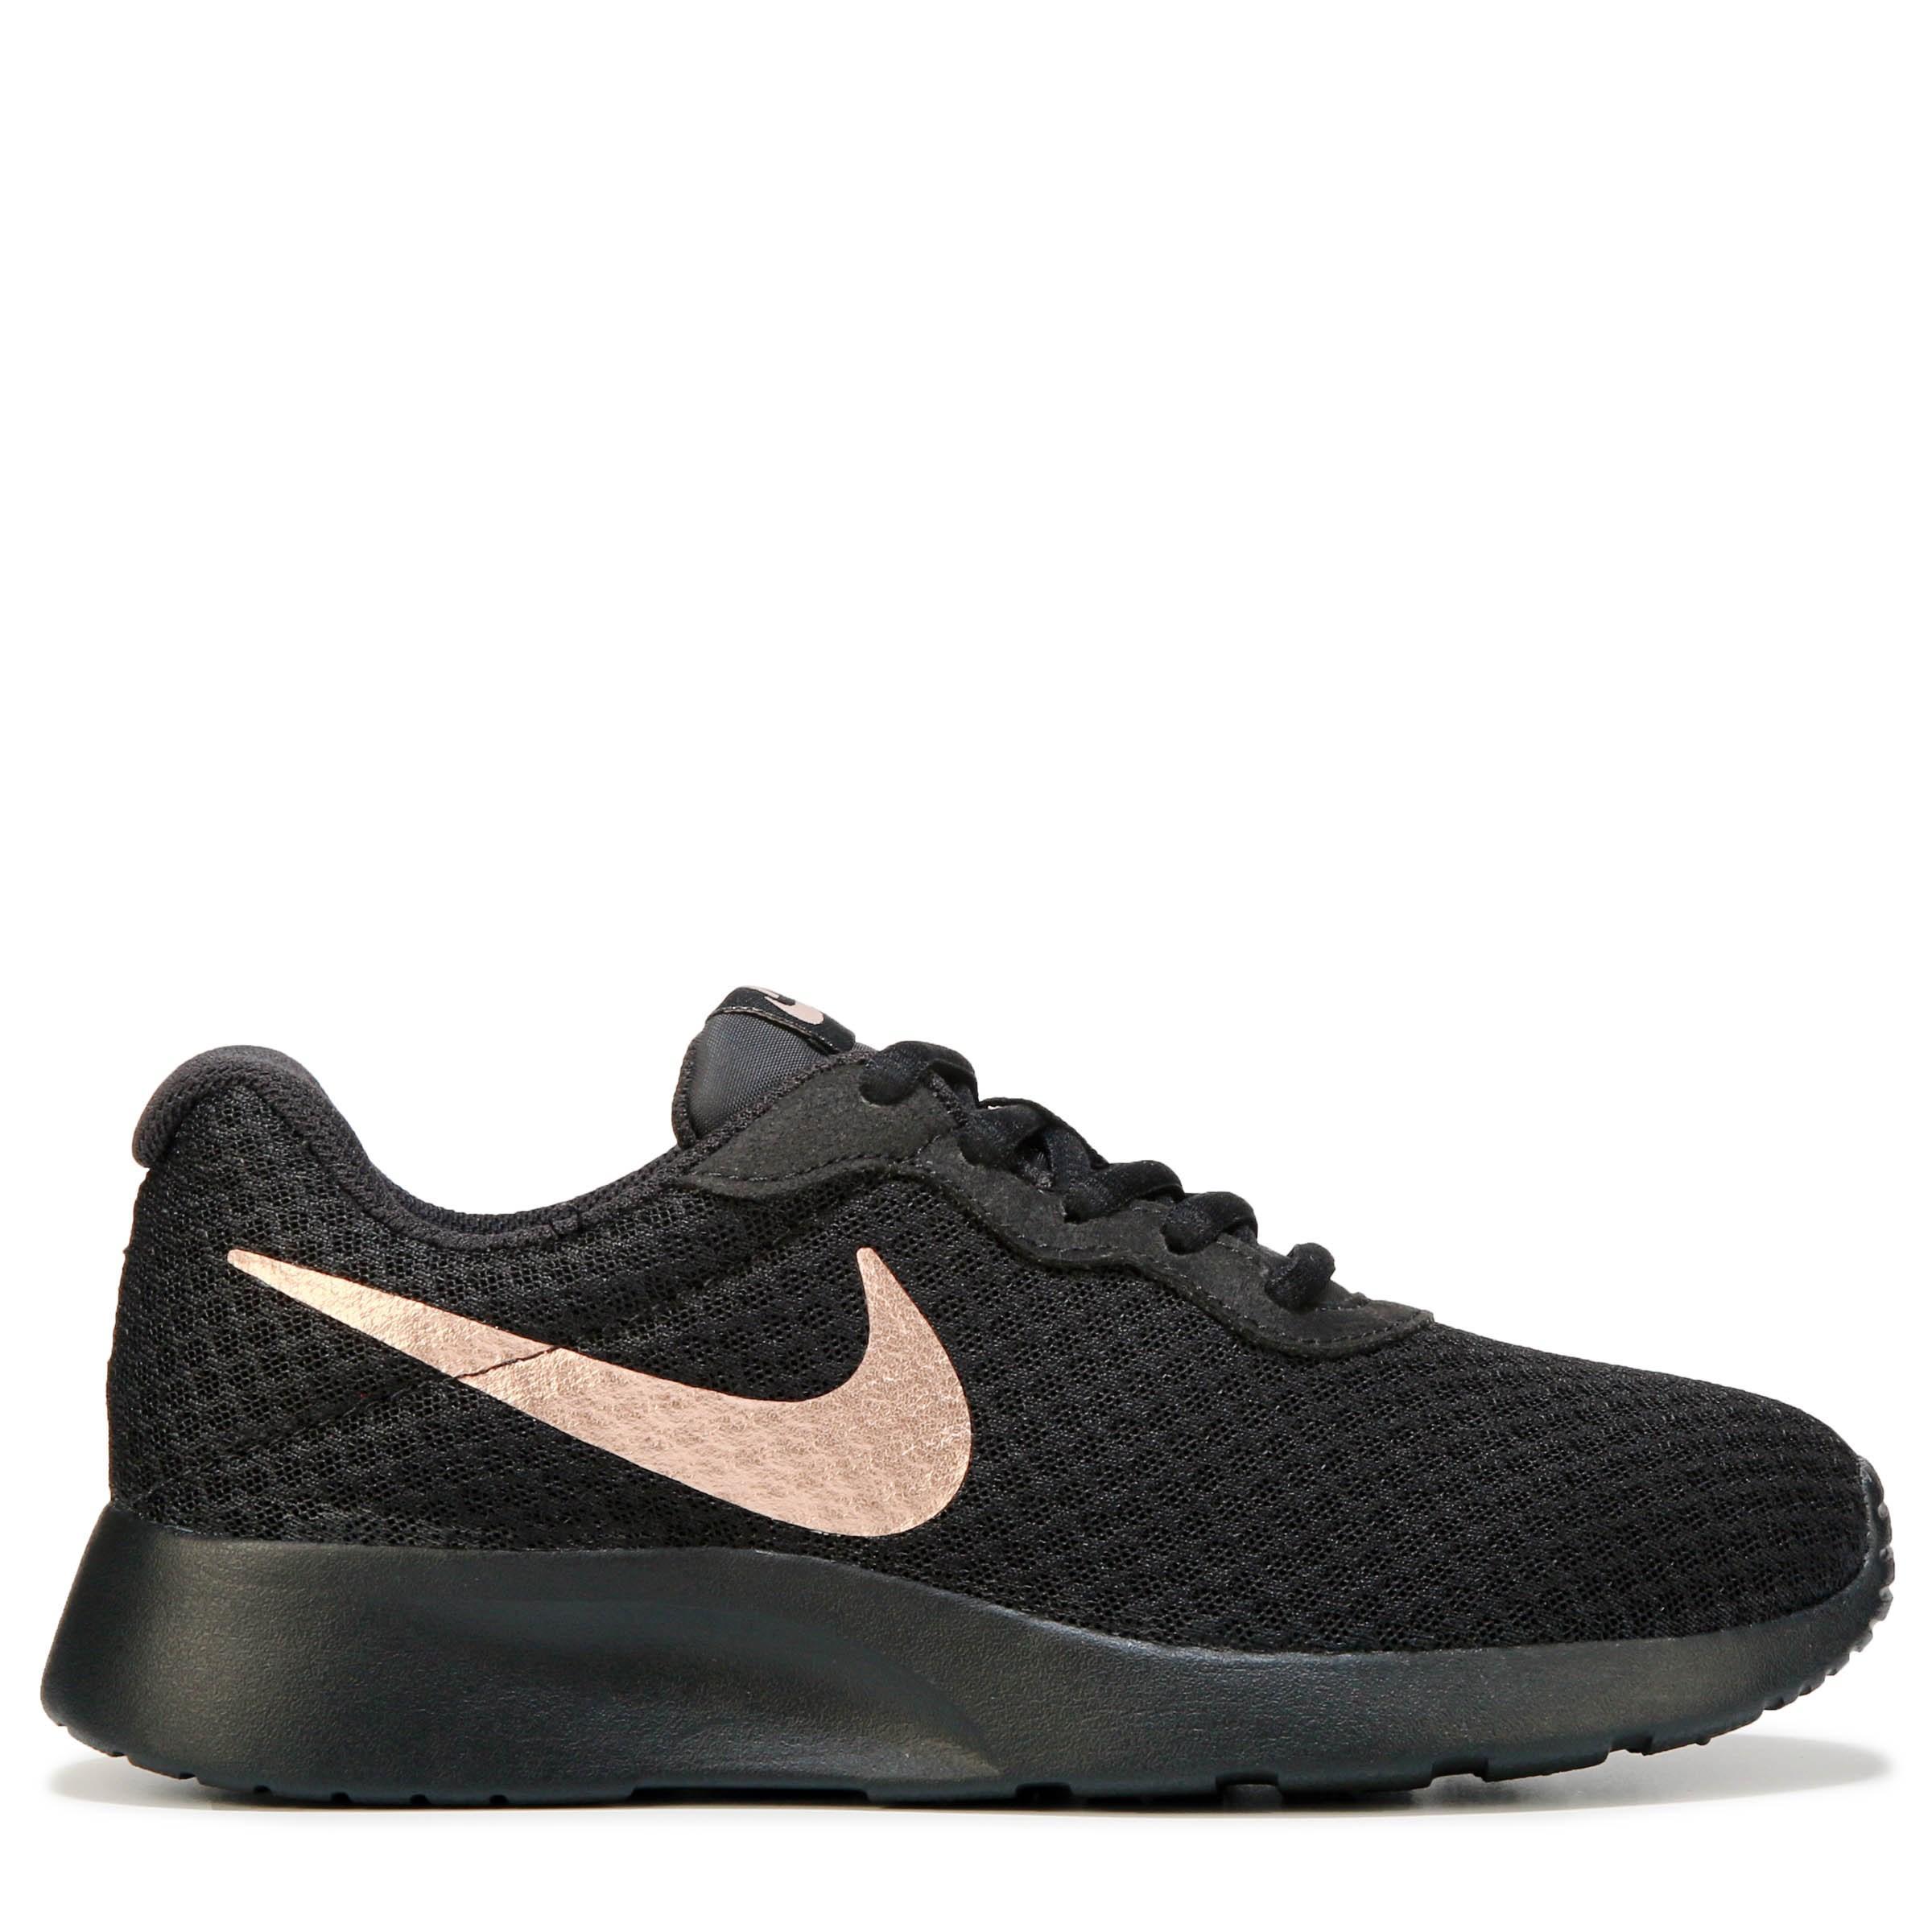 Nike Tanjun Shoes in Black/Gold (Black